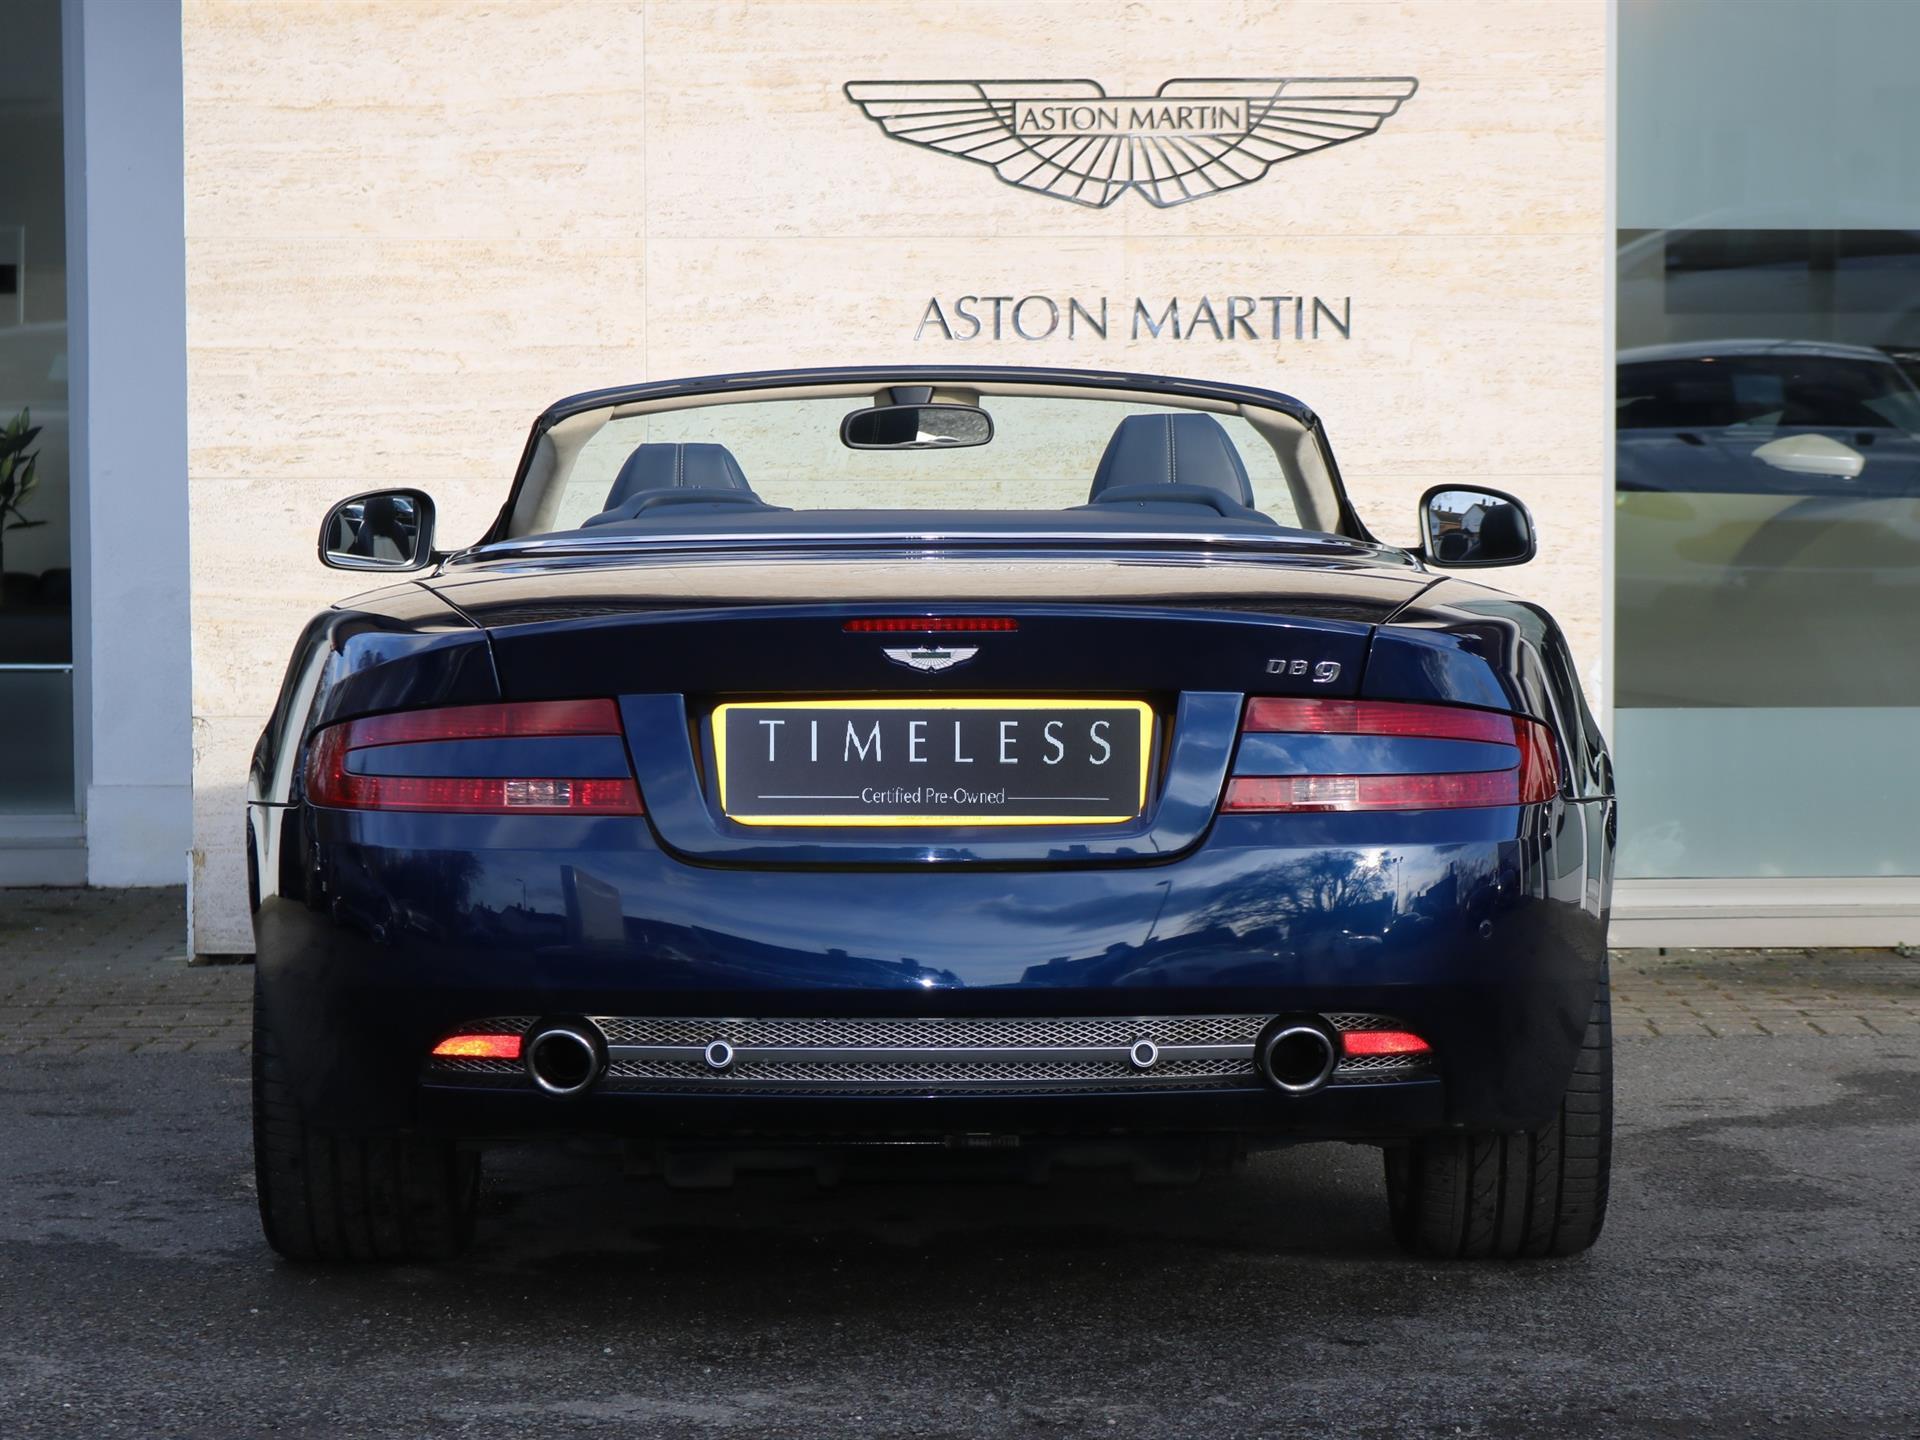 aston martin lagonda - pre-owned & used aston martins - car